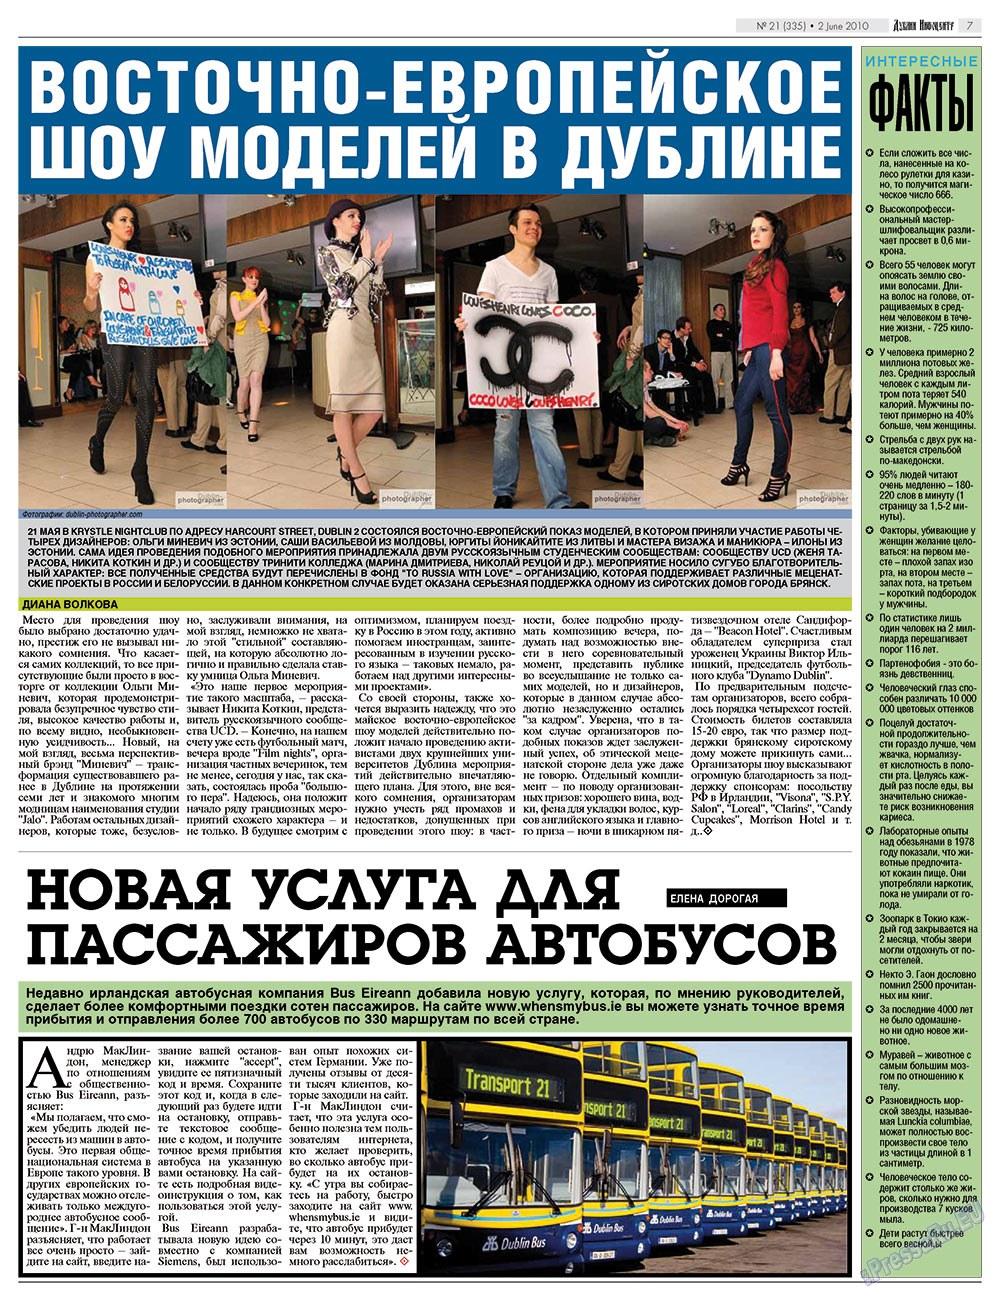 Дублин инфоцентр (газета). 2010 год, номер 21, стр. 7